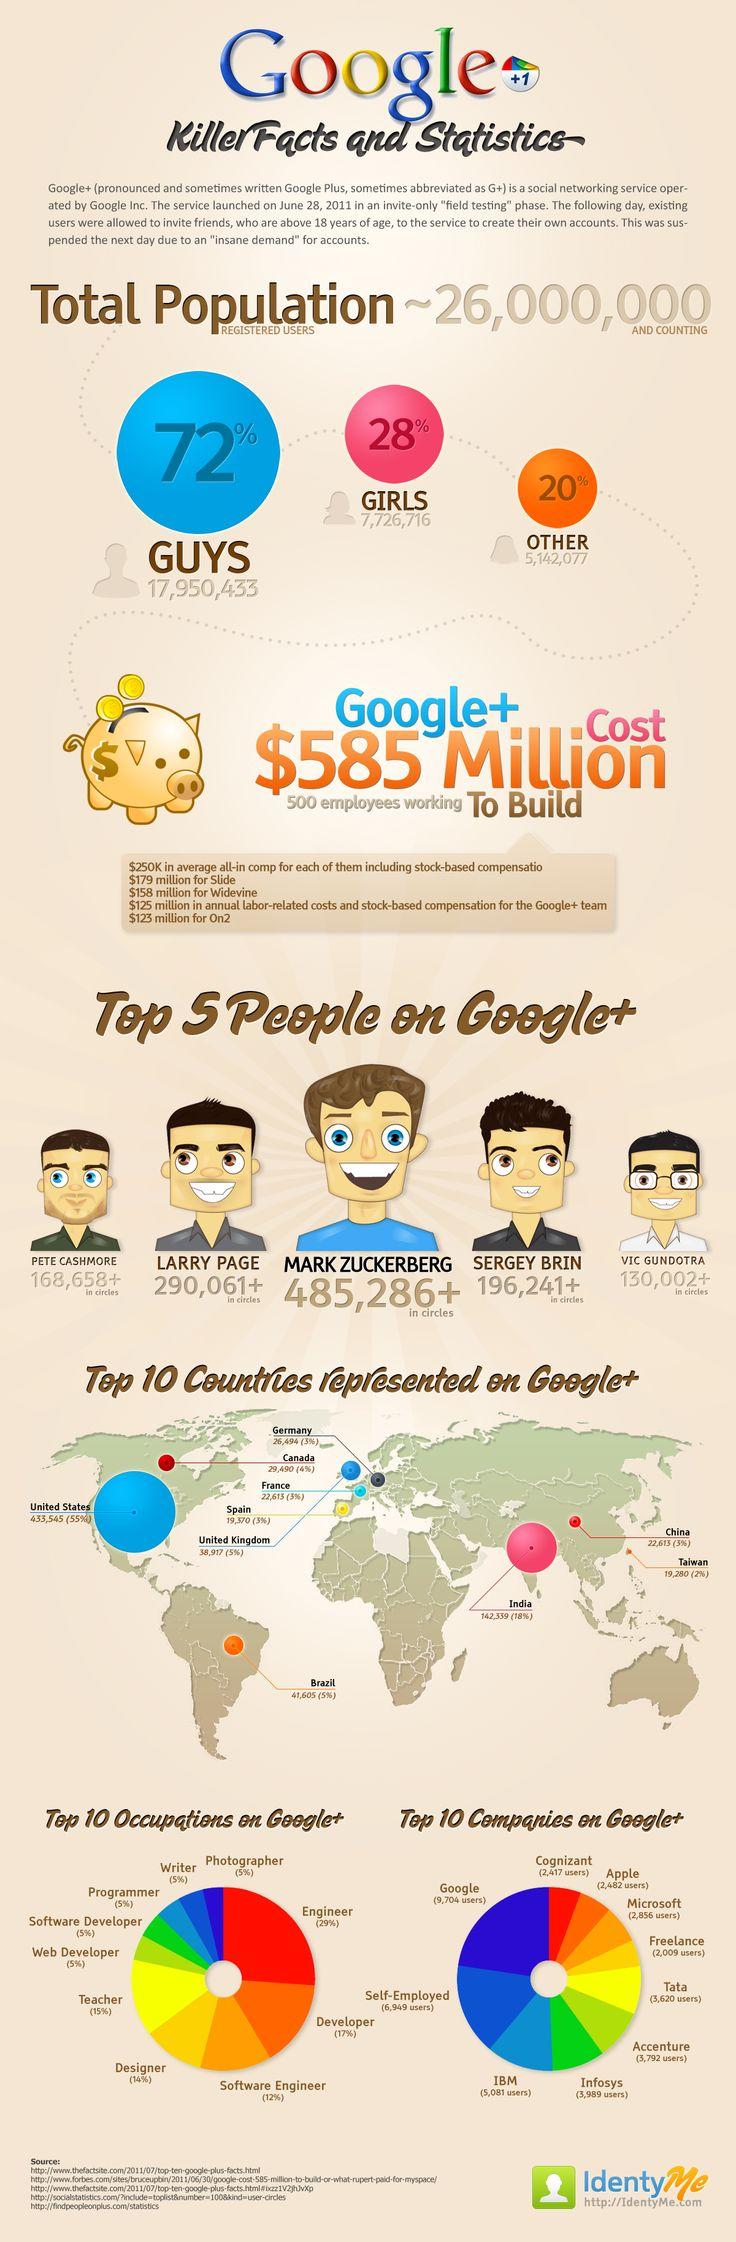 #Google+ Killer Facts & Statistics #Infographic